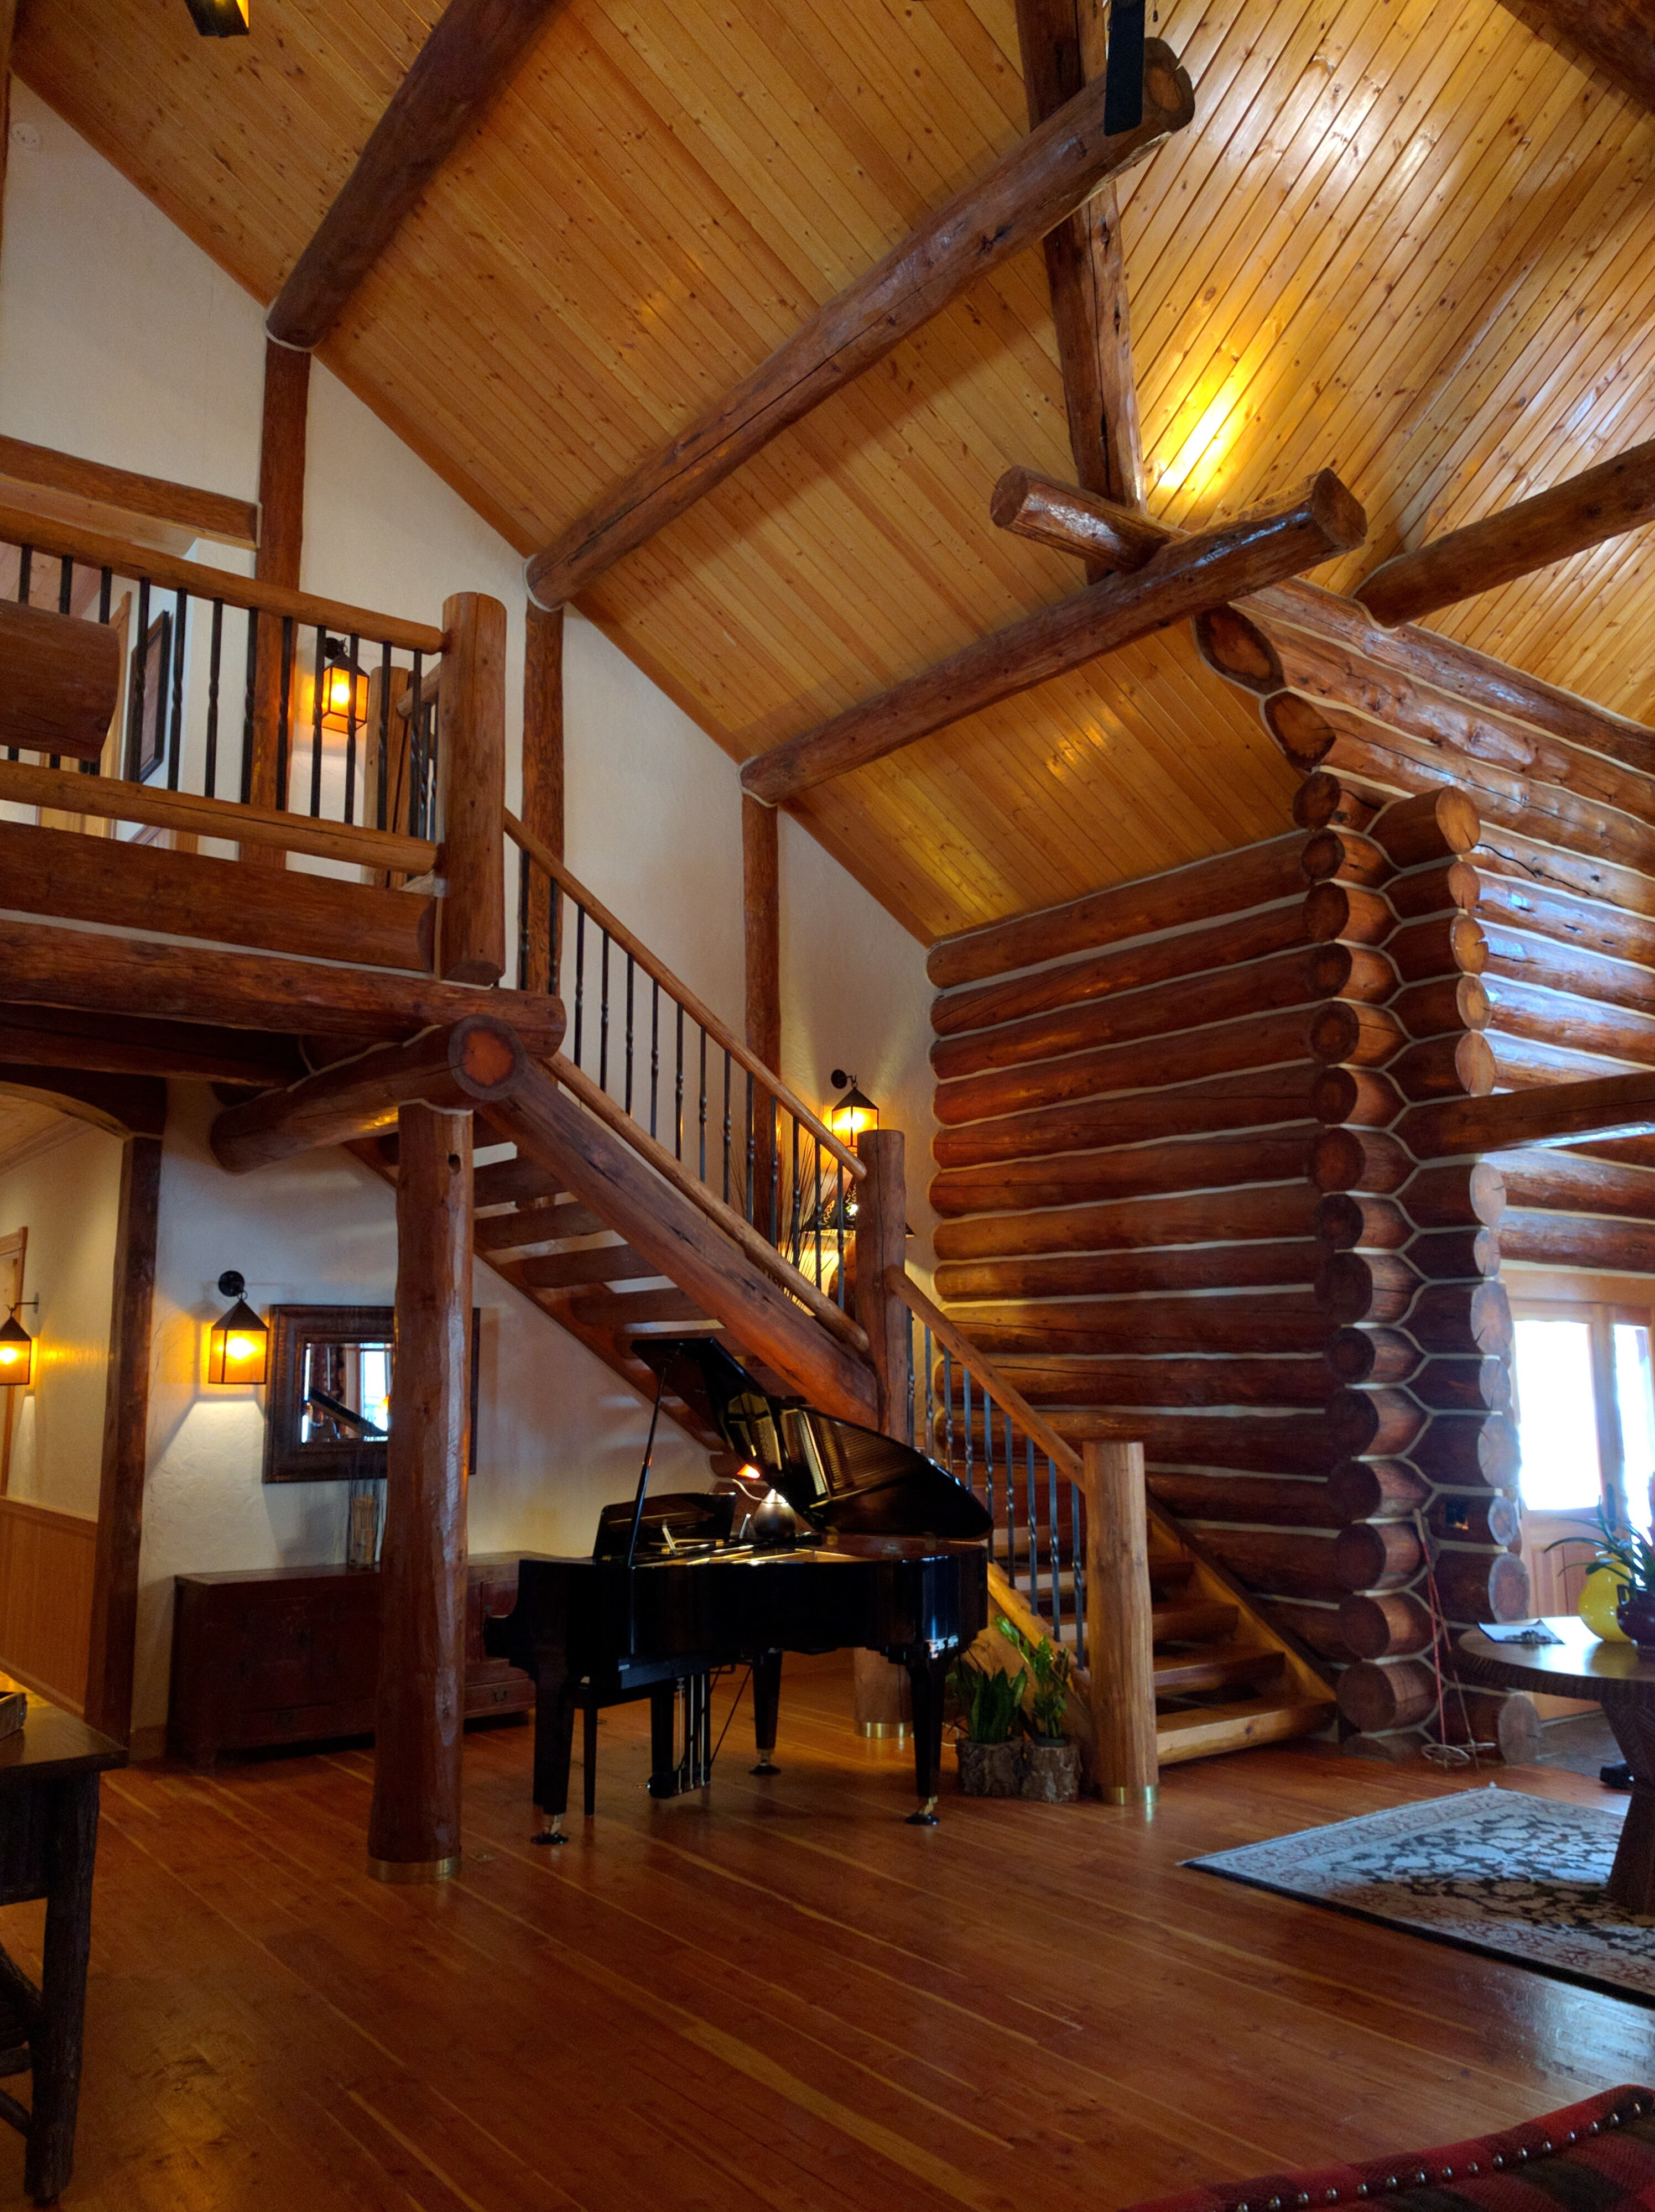 The Grand River Lodge A Private Luxury Retreat In